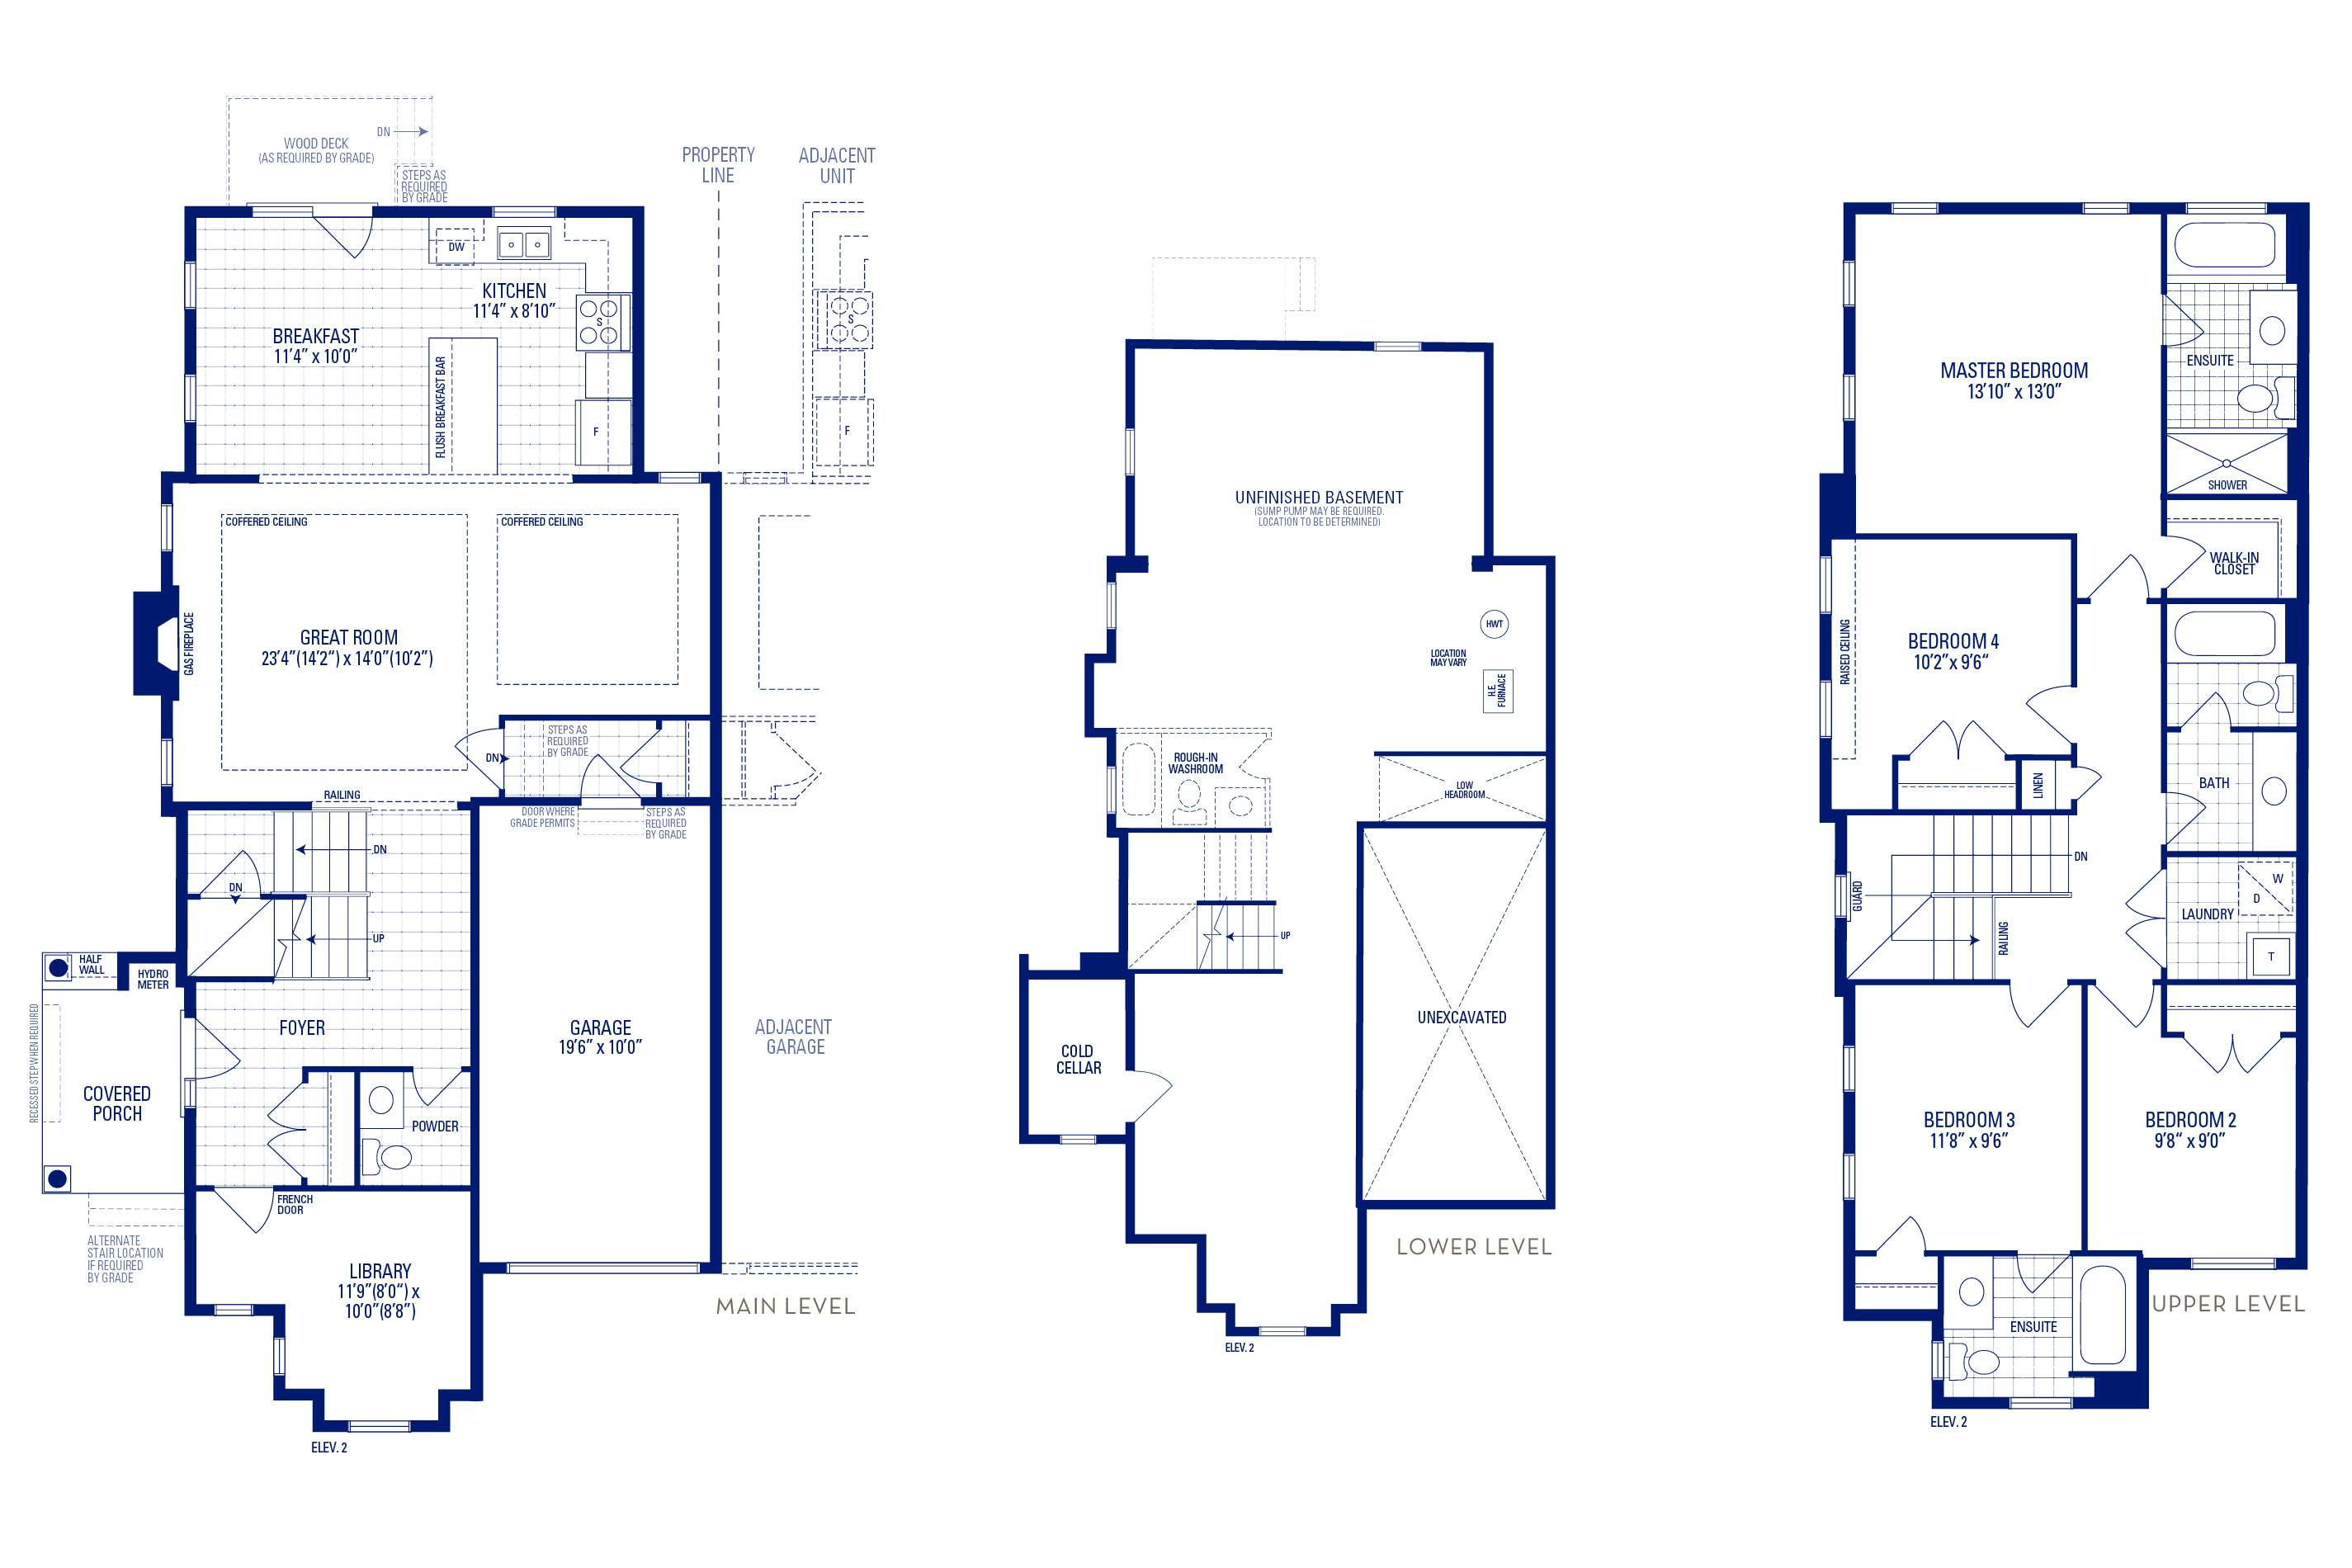 Newberry 12 Elev. 2 Floorplan